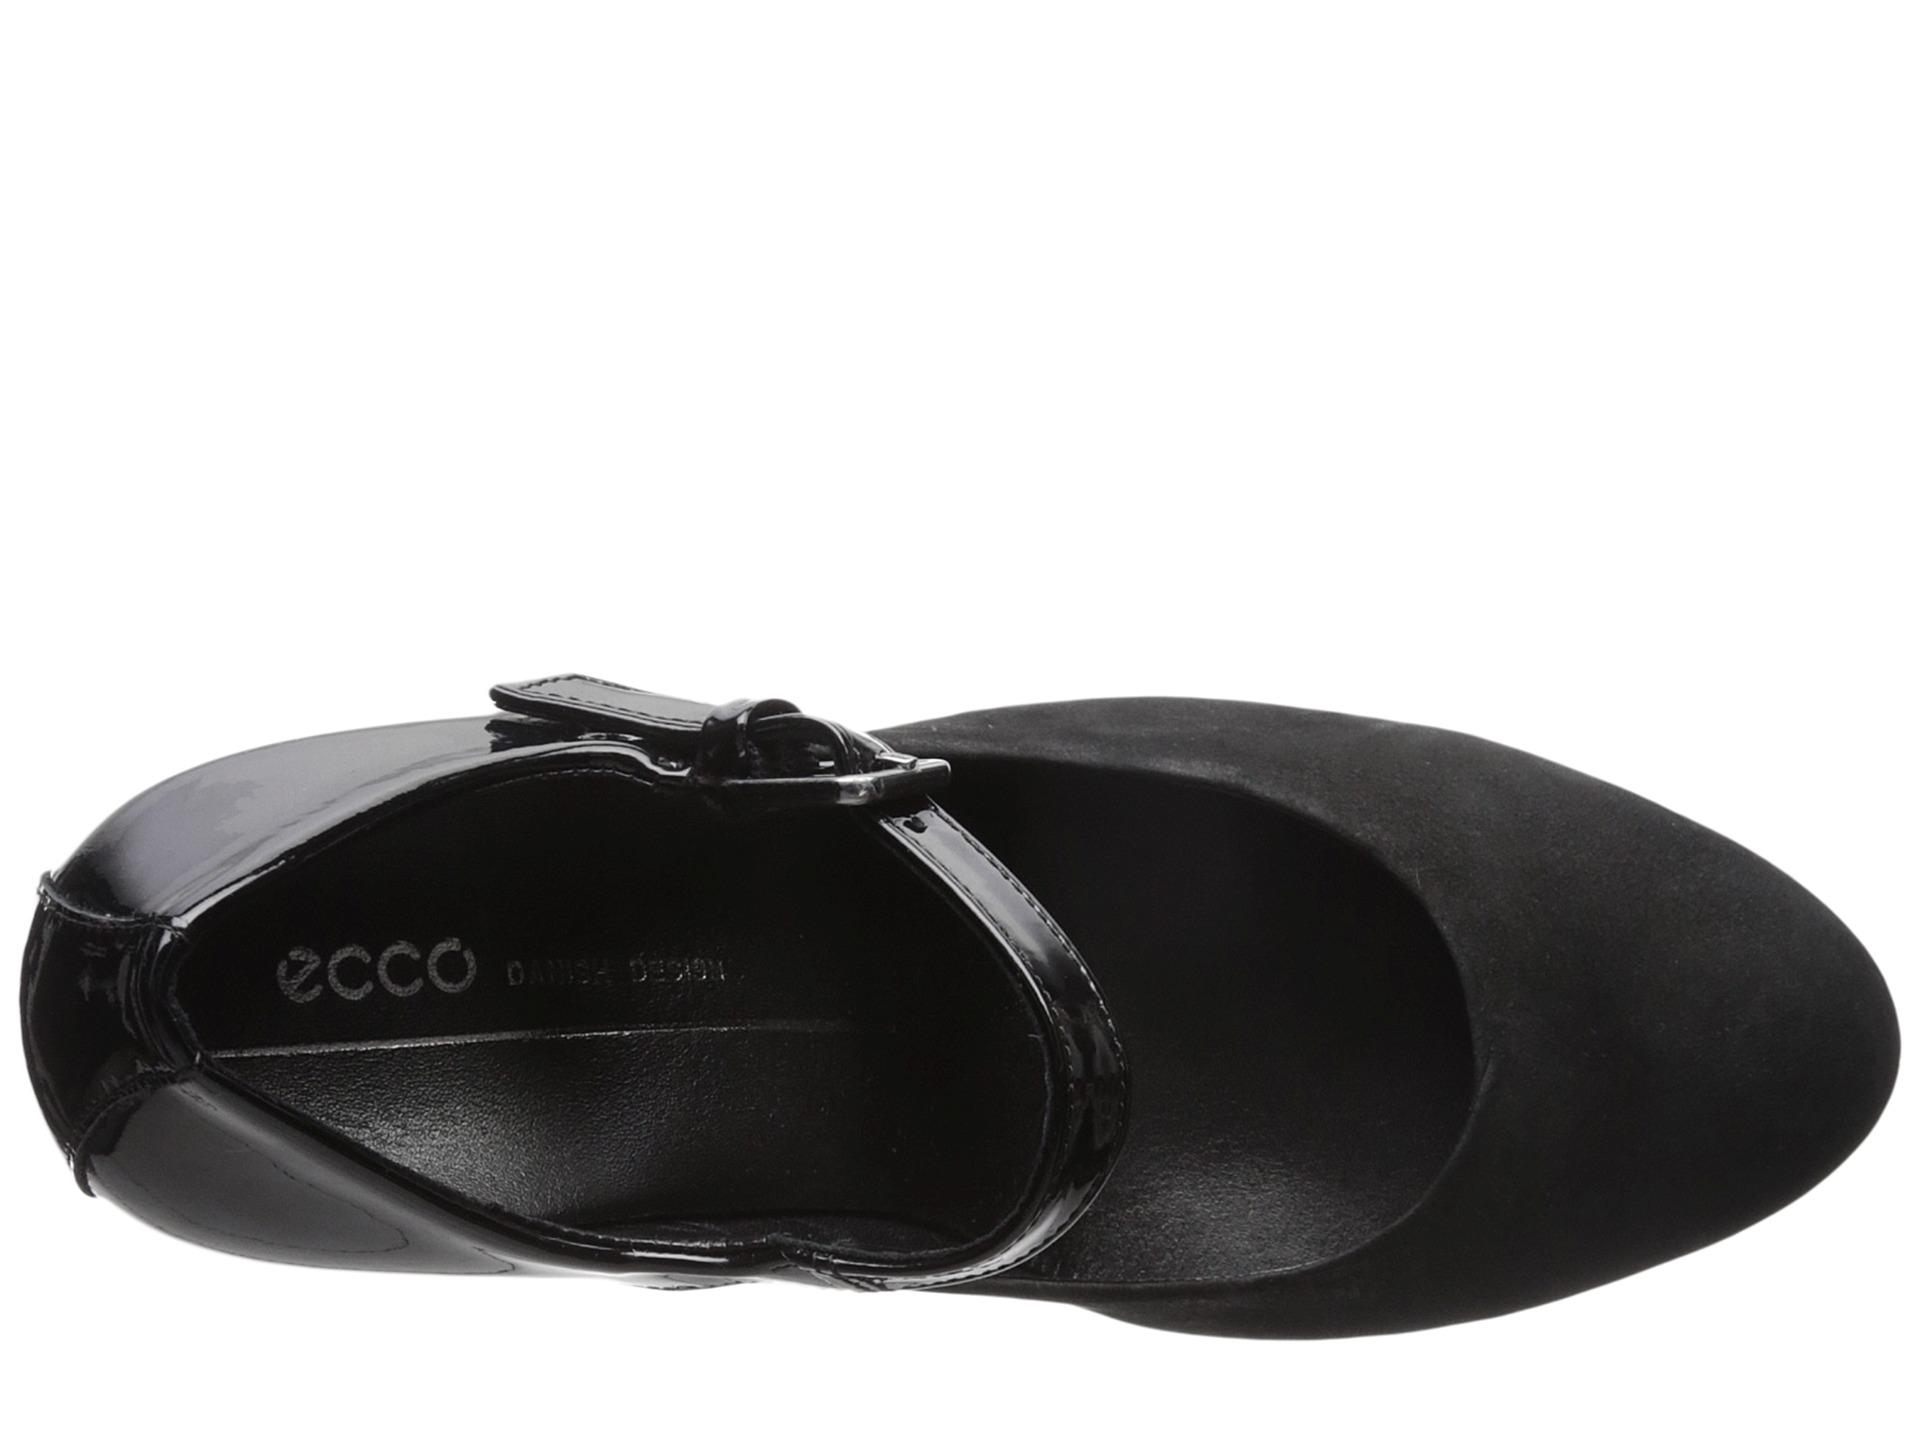 Ecco Shoes Womens Size Chart